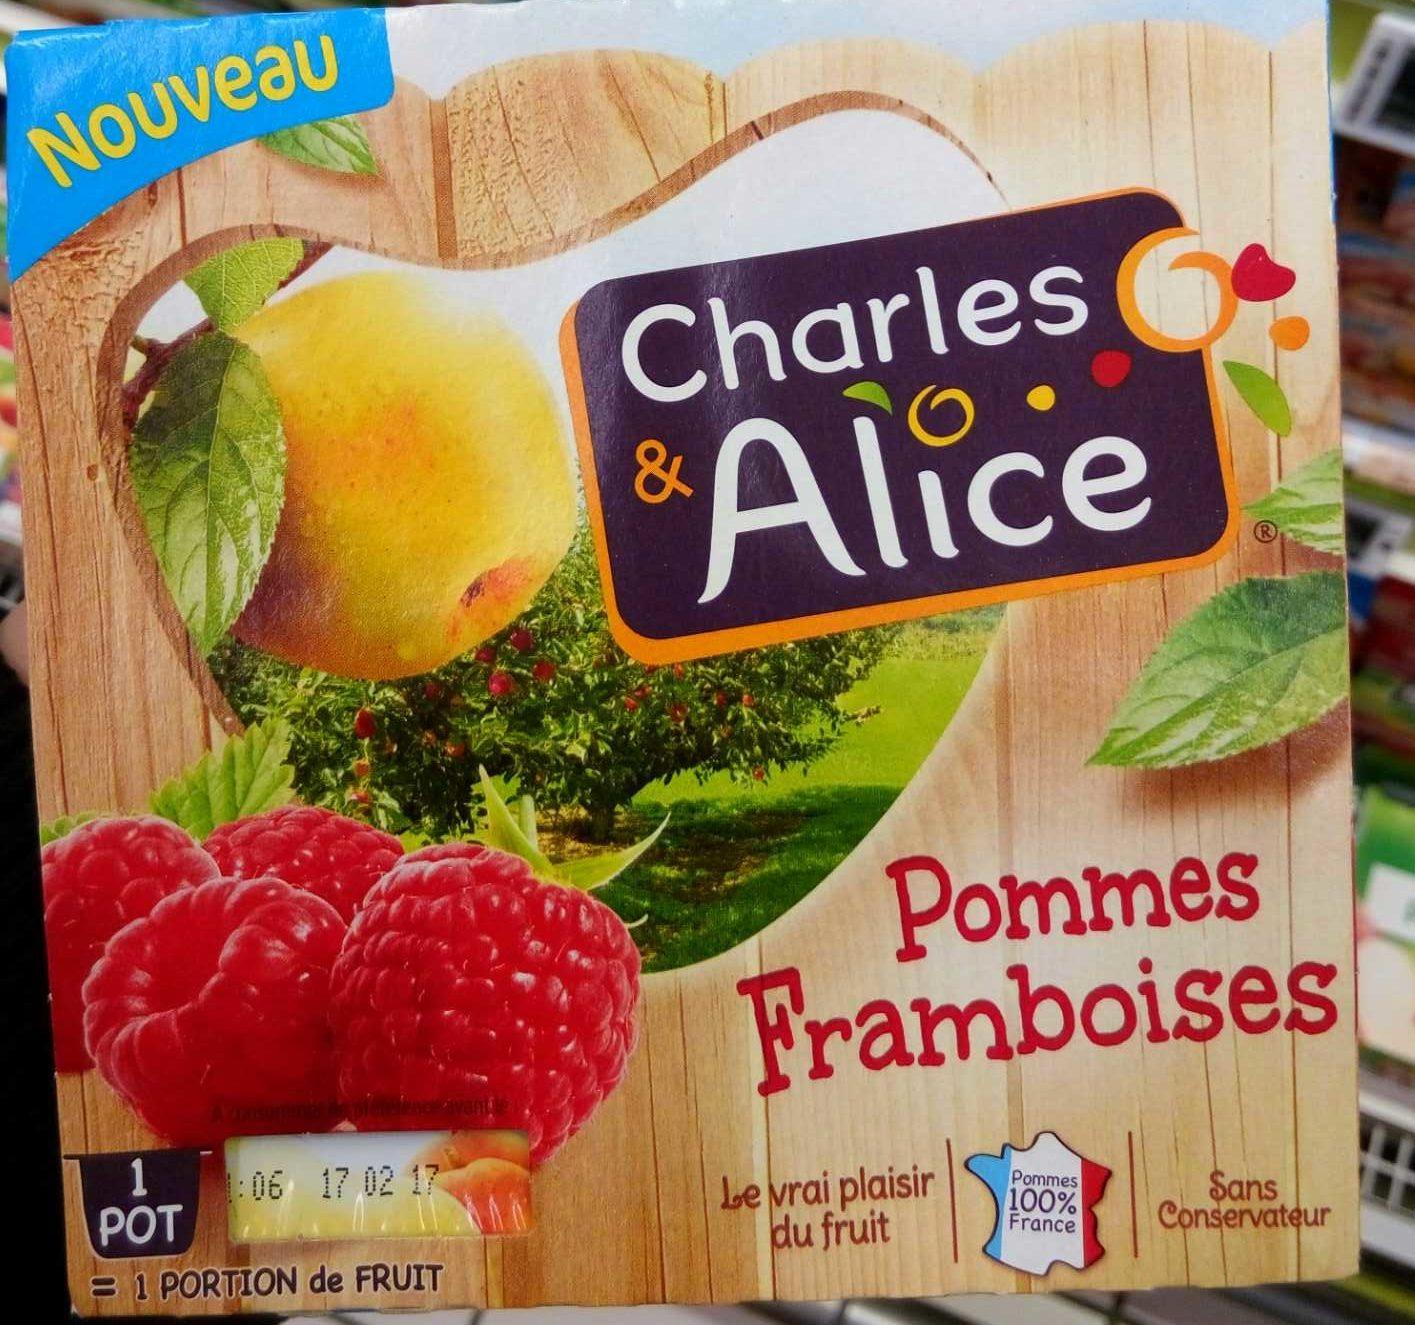 Pommes Framboises - Product